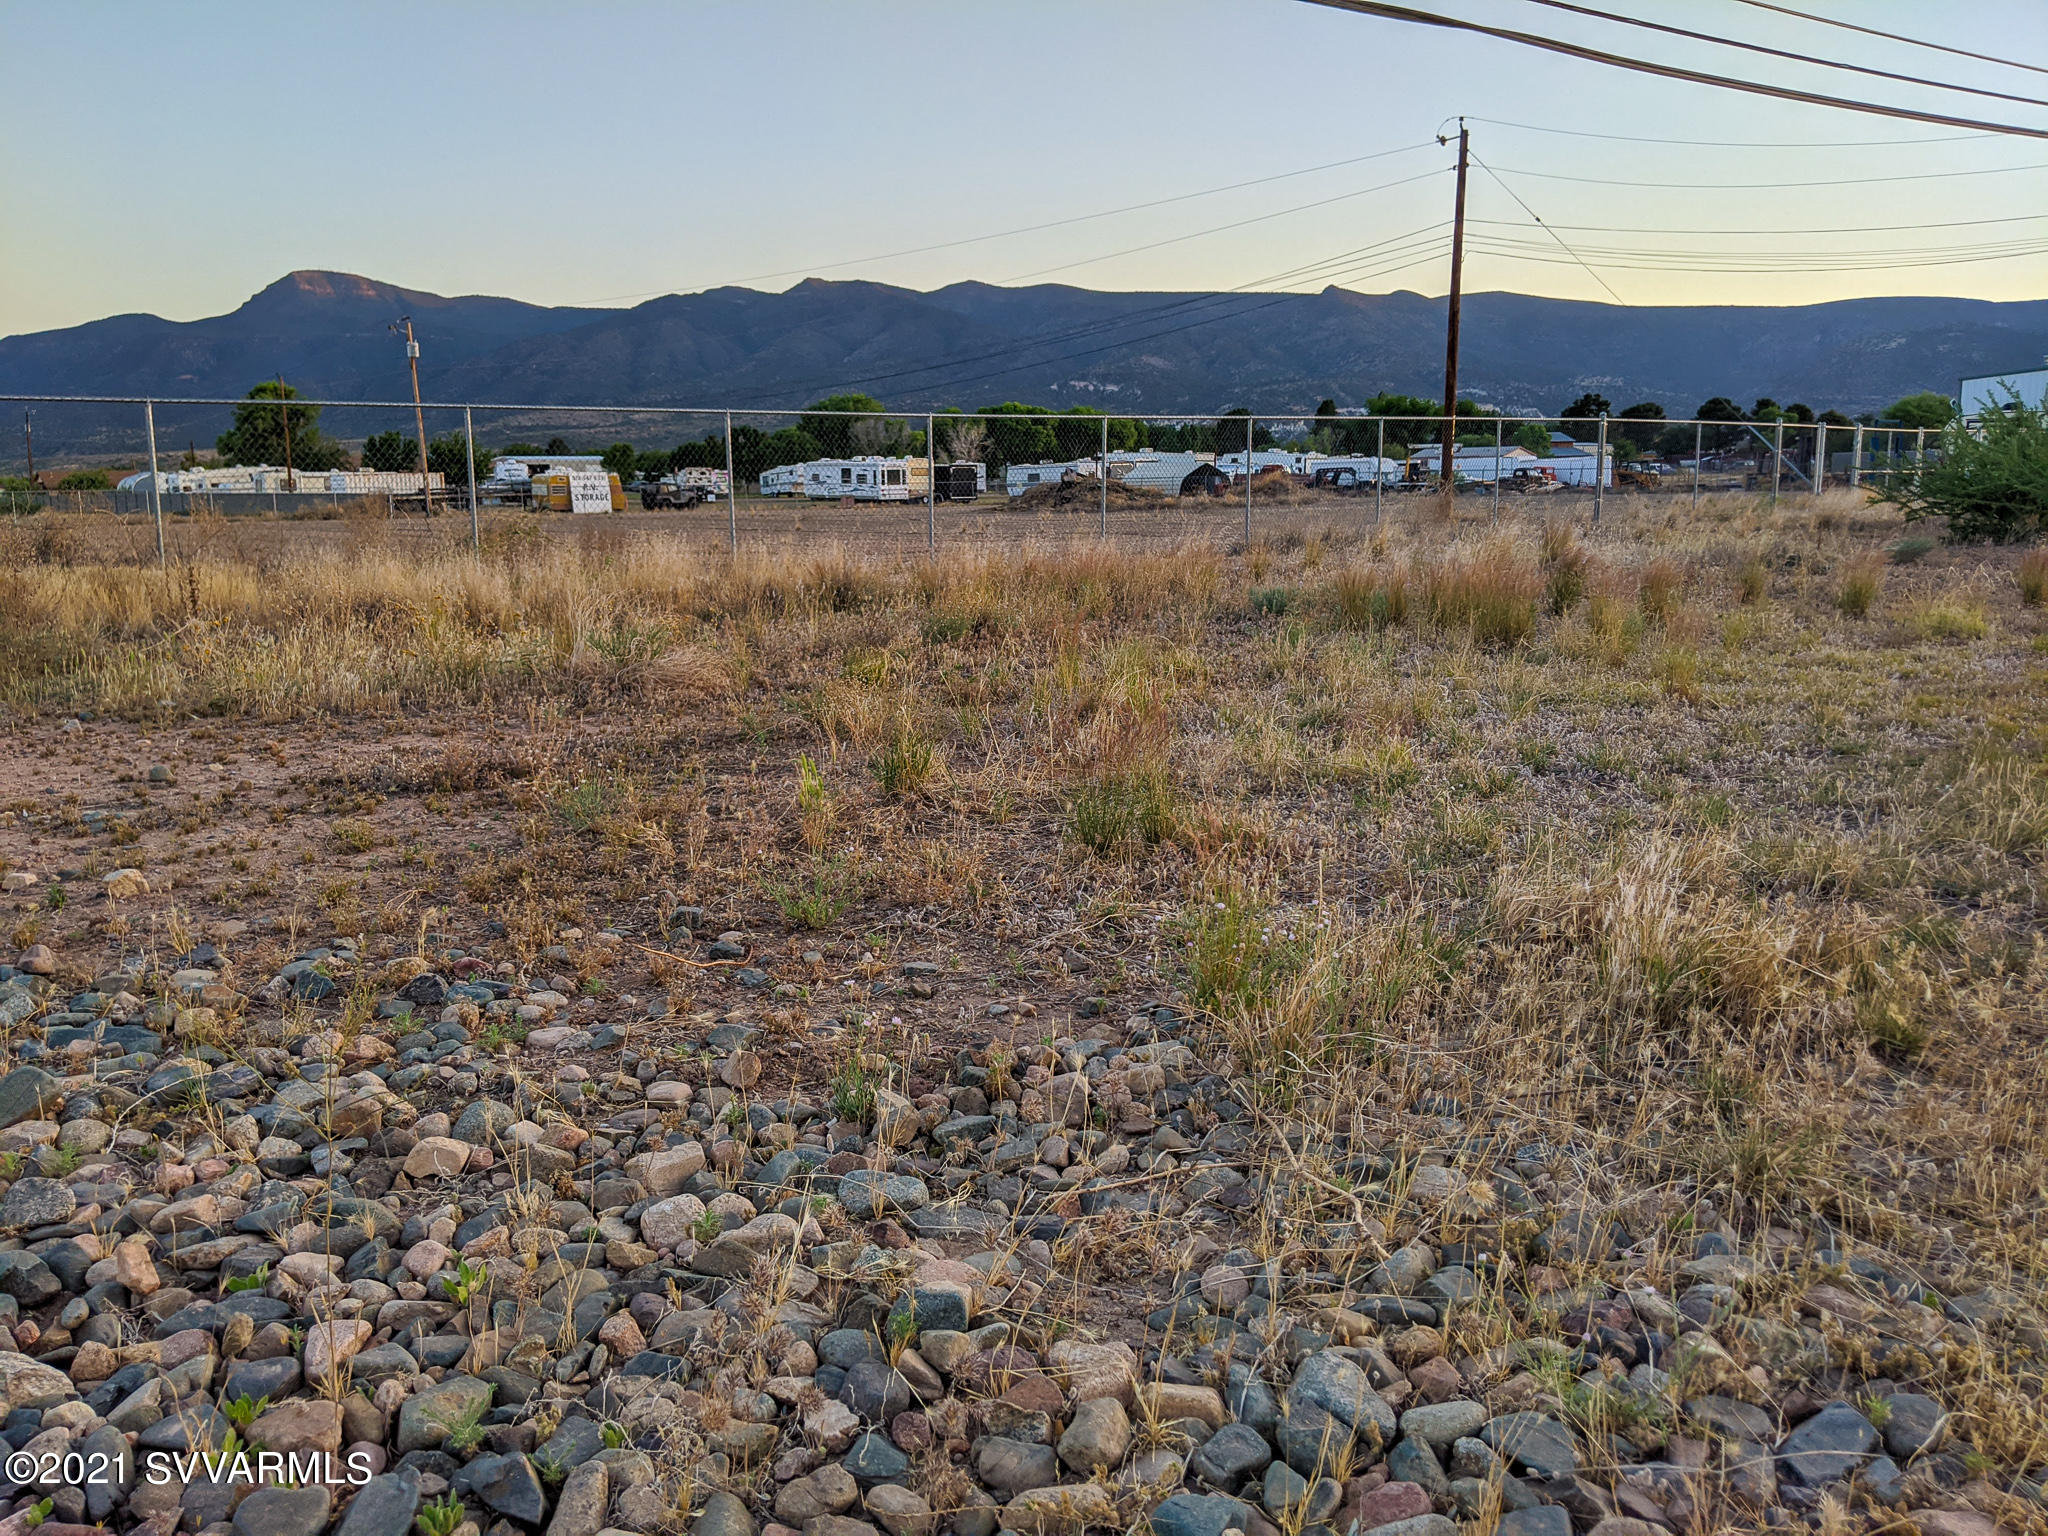 549/563 Howards Camp Verde, AZ 86322